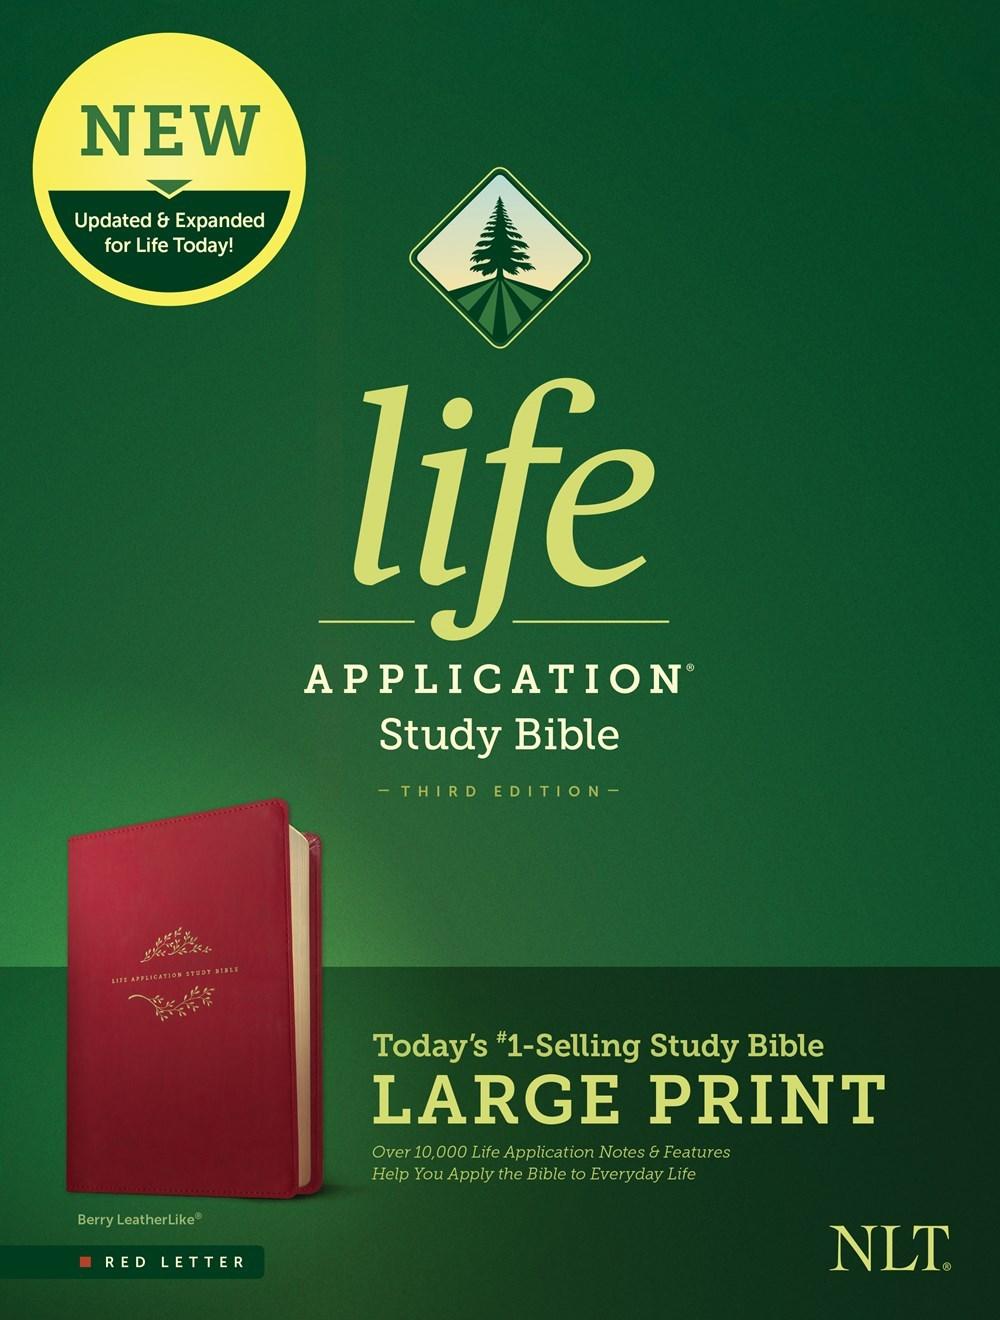 NLT Life Application Study Bible/Large Print (Third Edition) (RL)-Berry LeatherLike